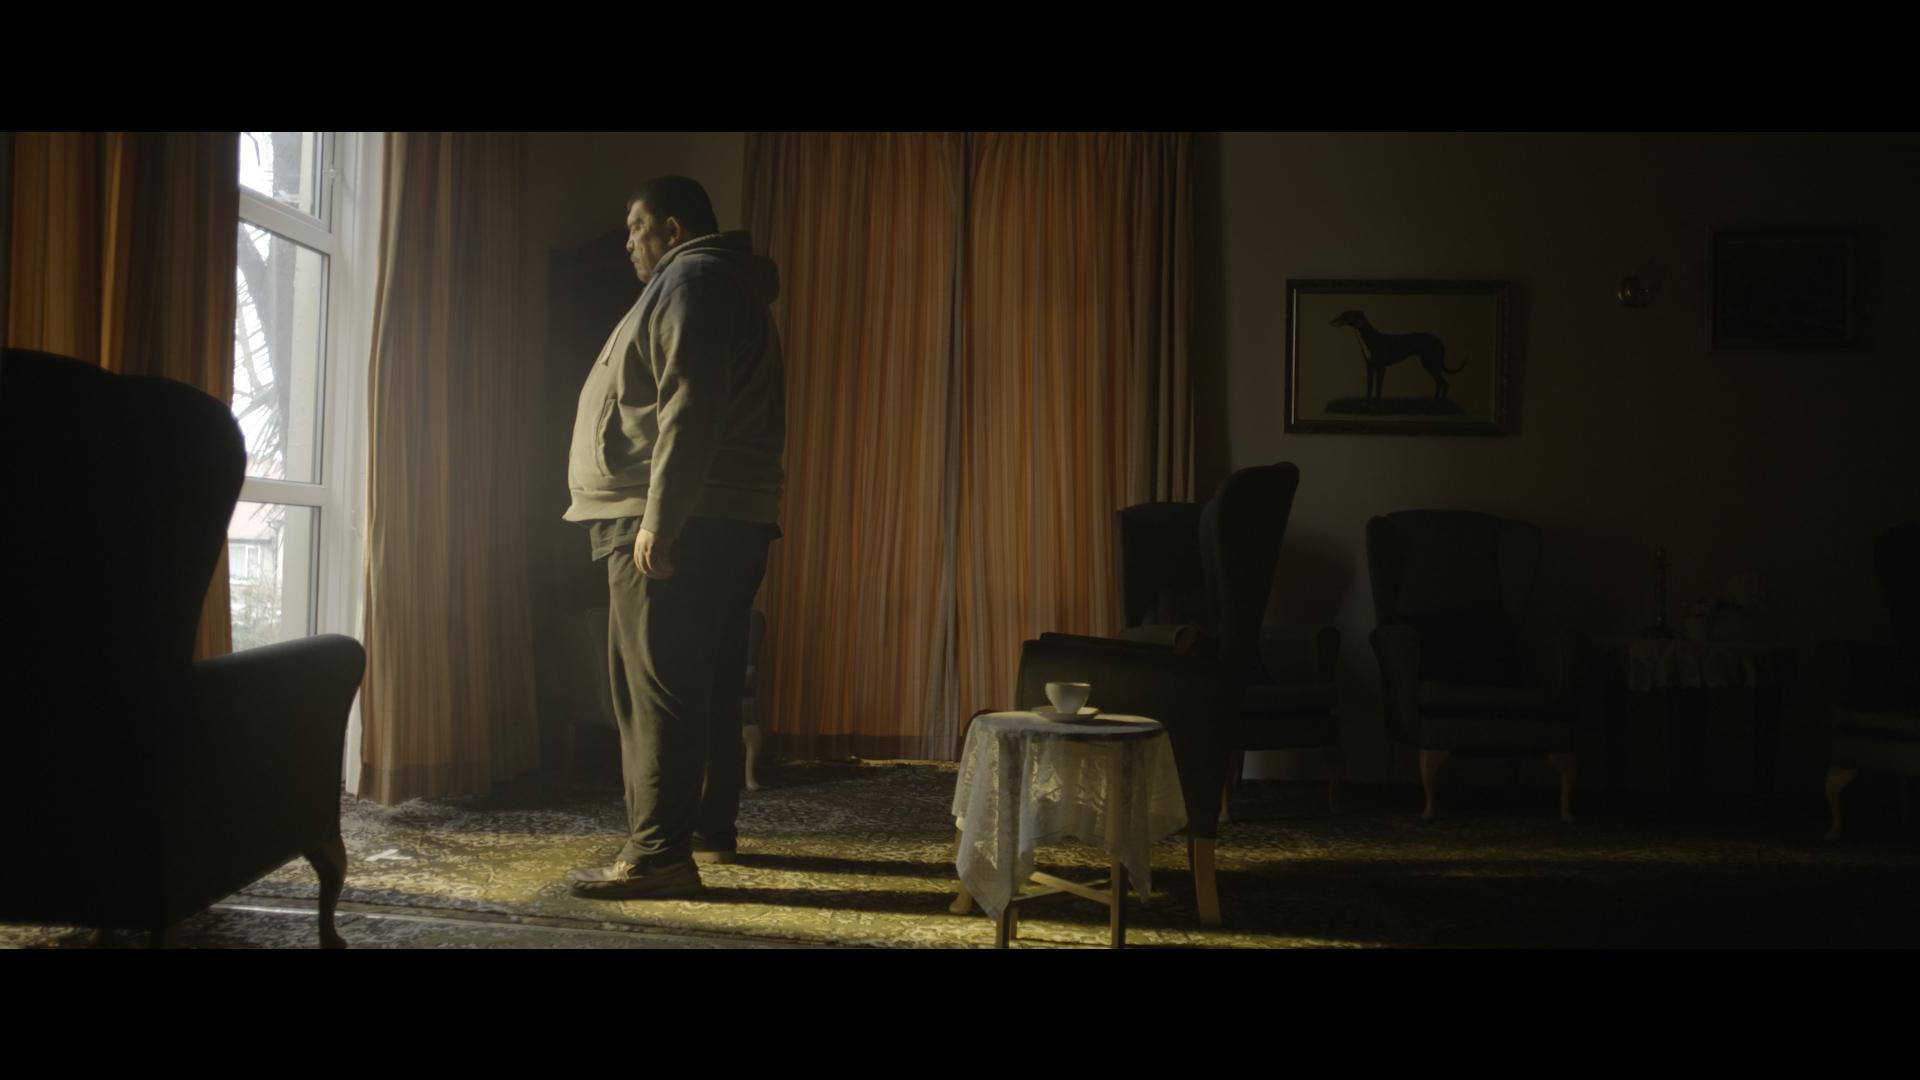 Danny Lacey short film